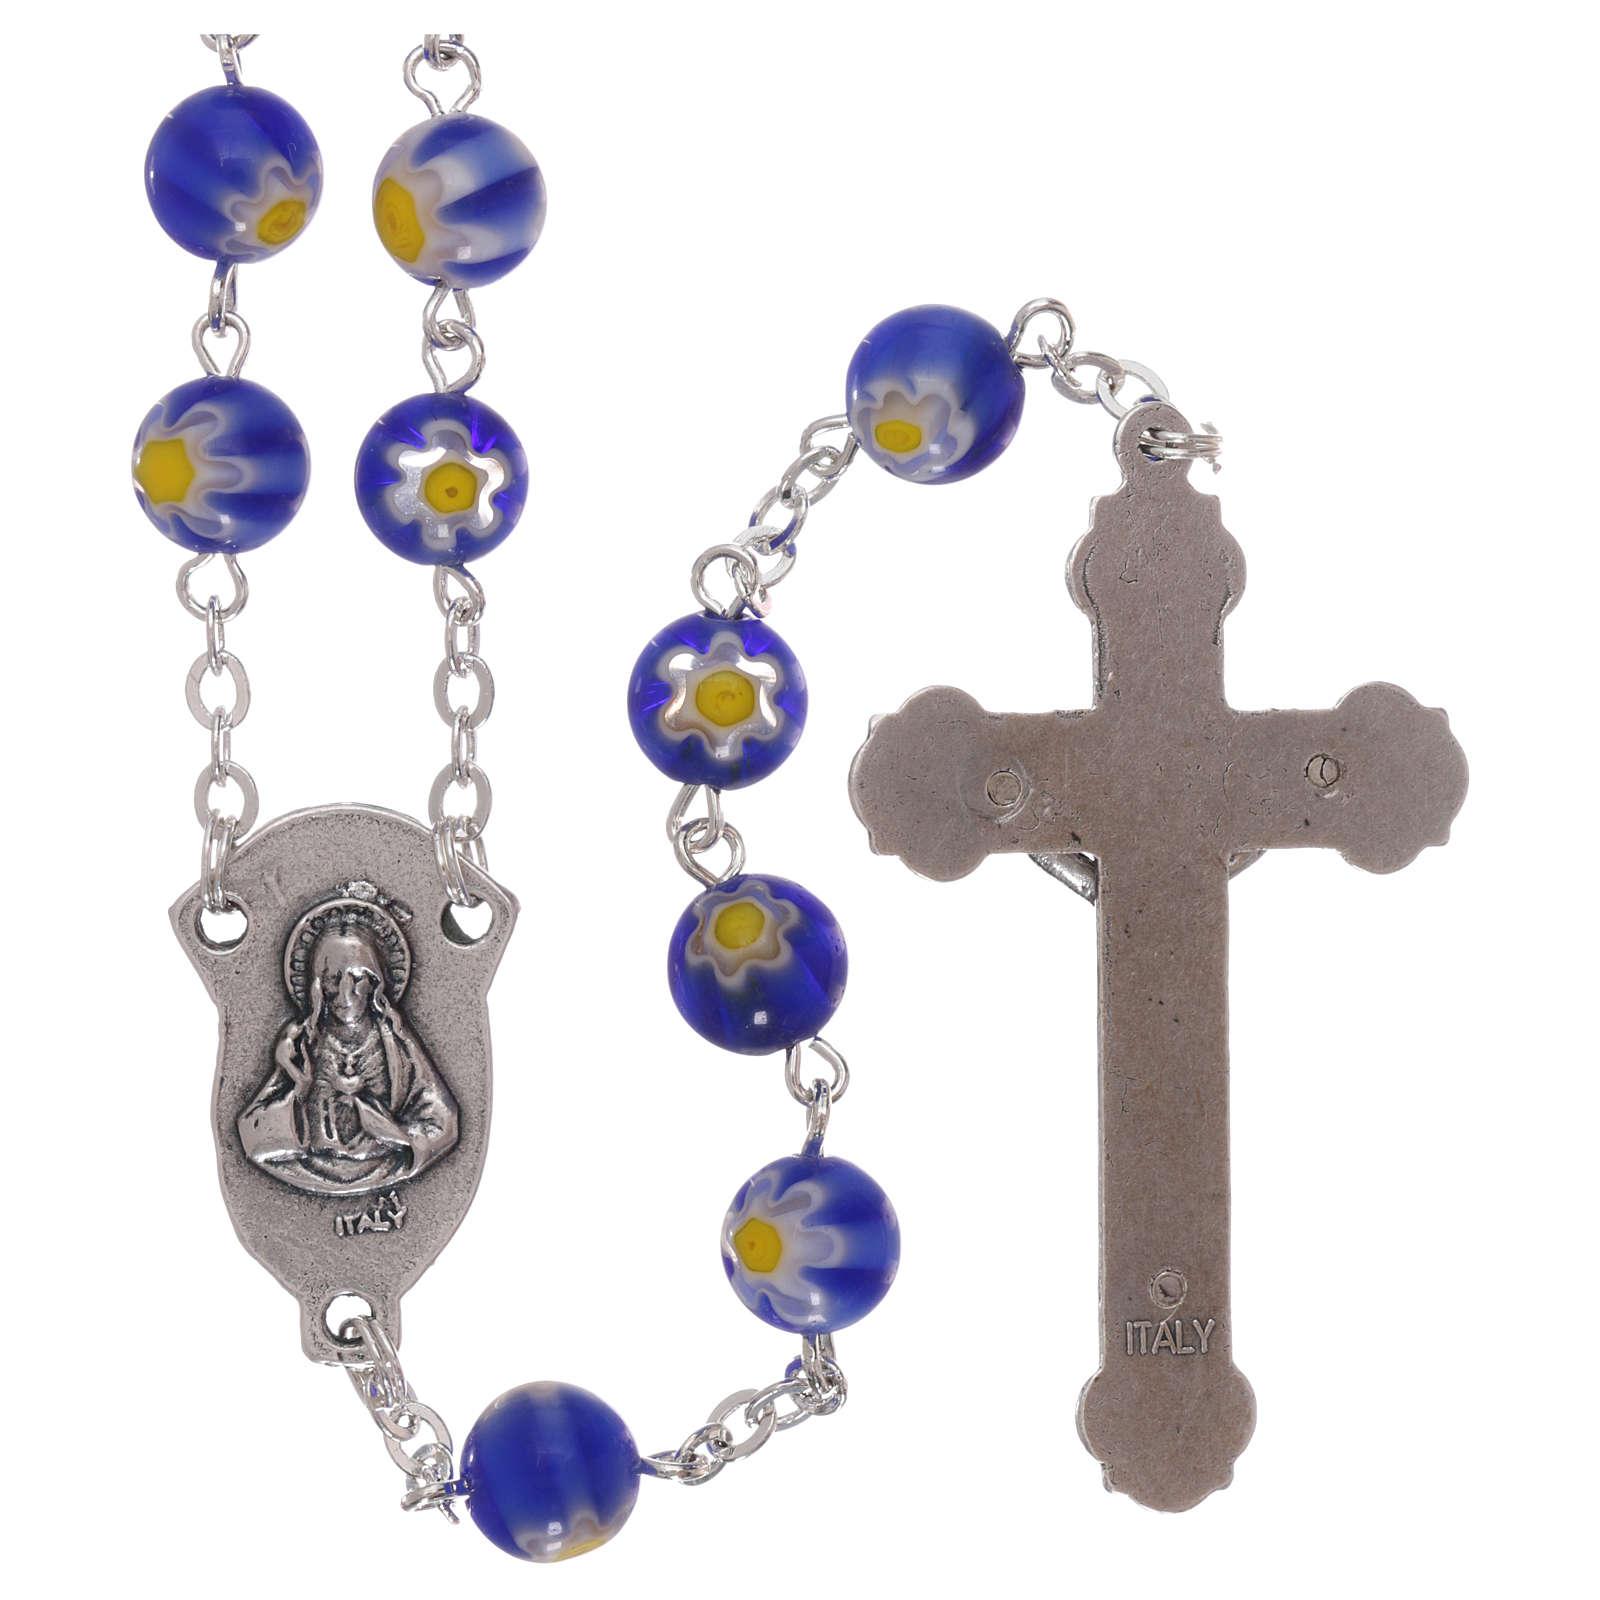 Blue Murano glass style rosary beads, 8mm 4